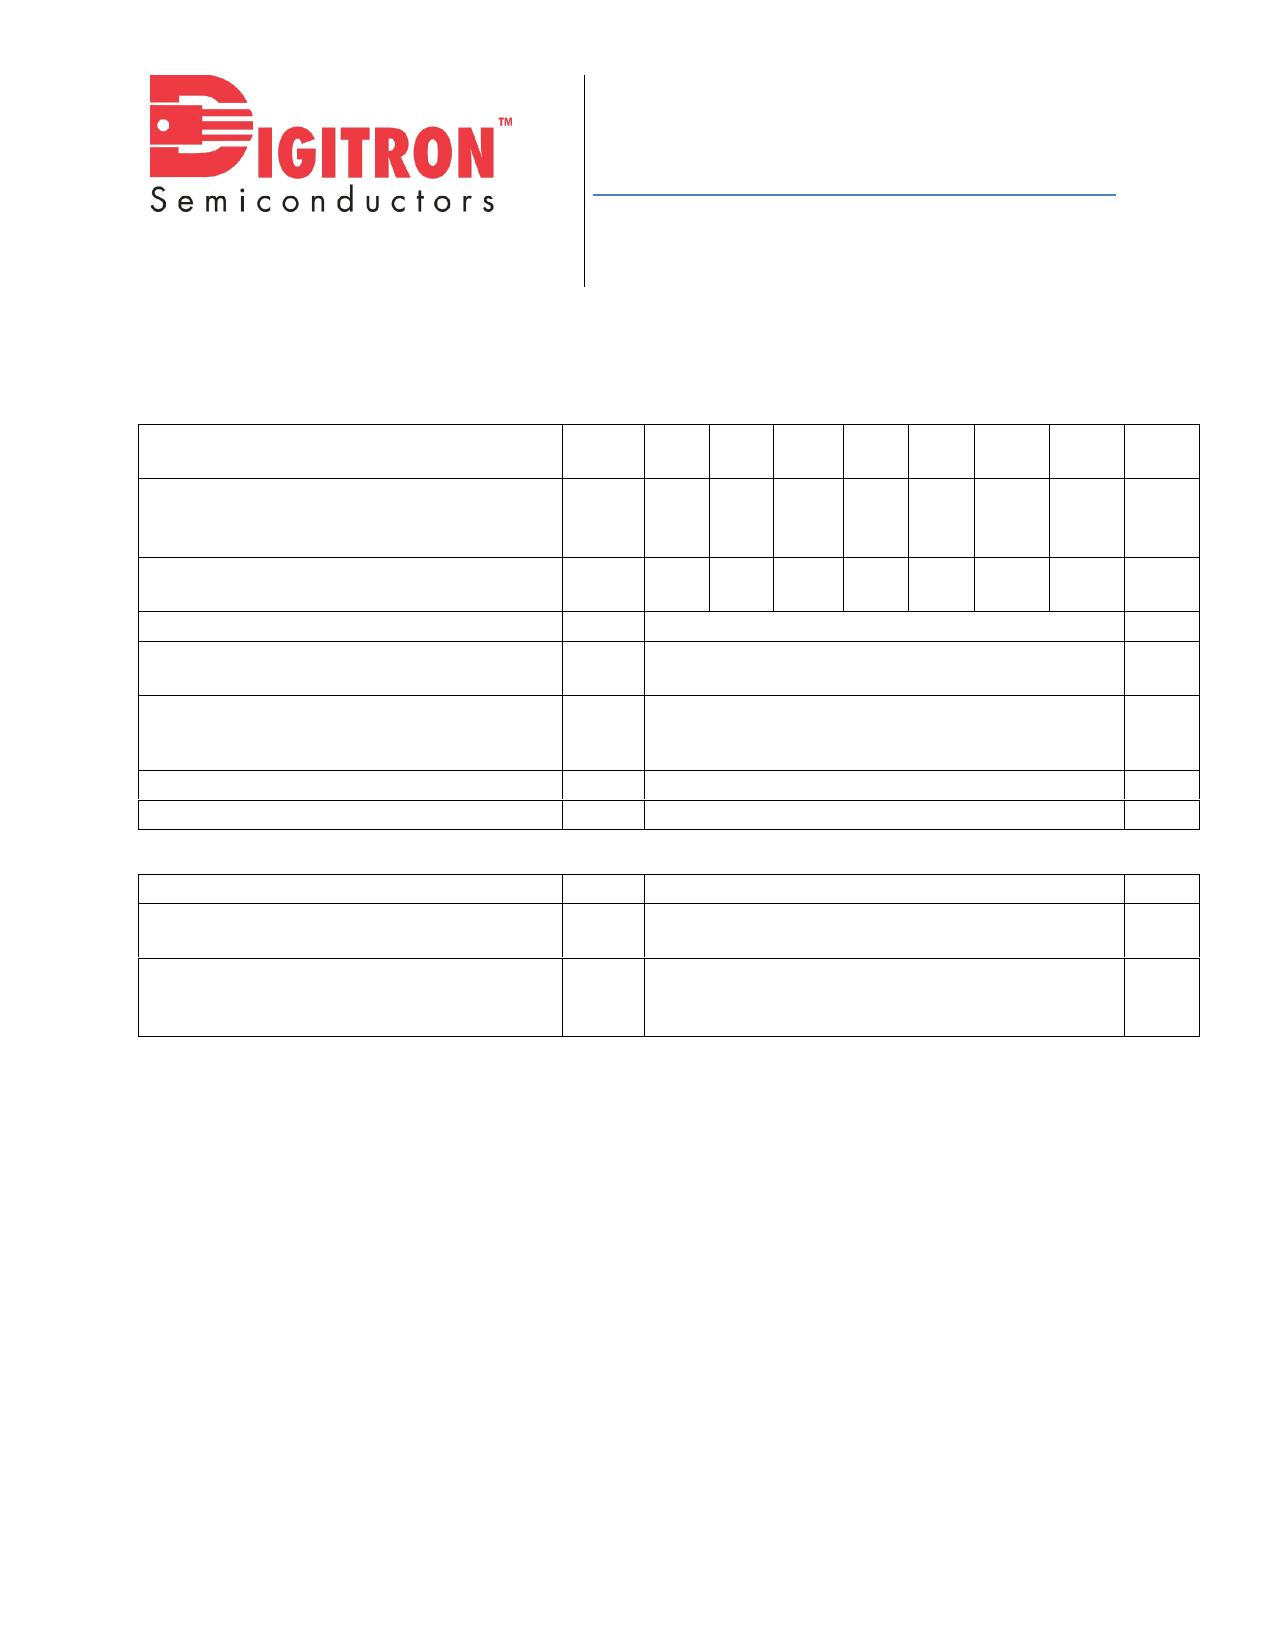 MR2008 데이터시트 및 MR2008 PDF